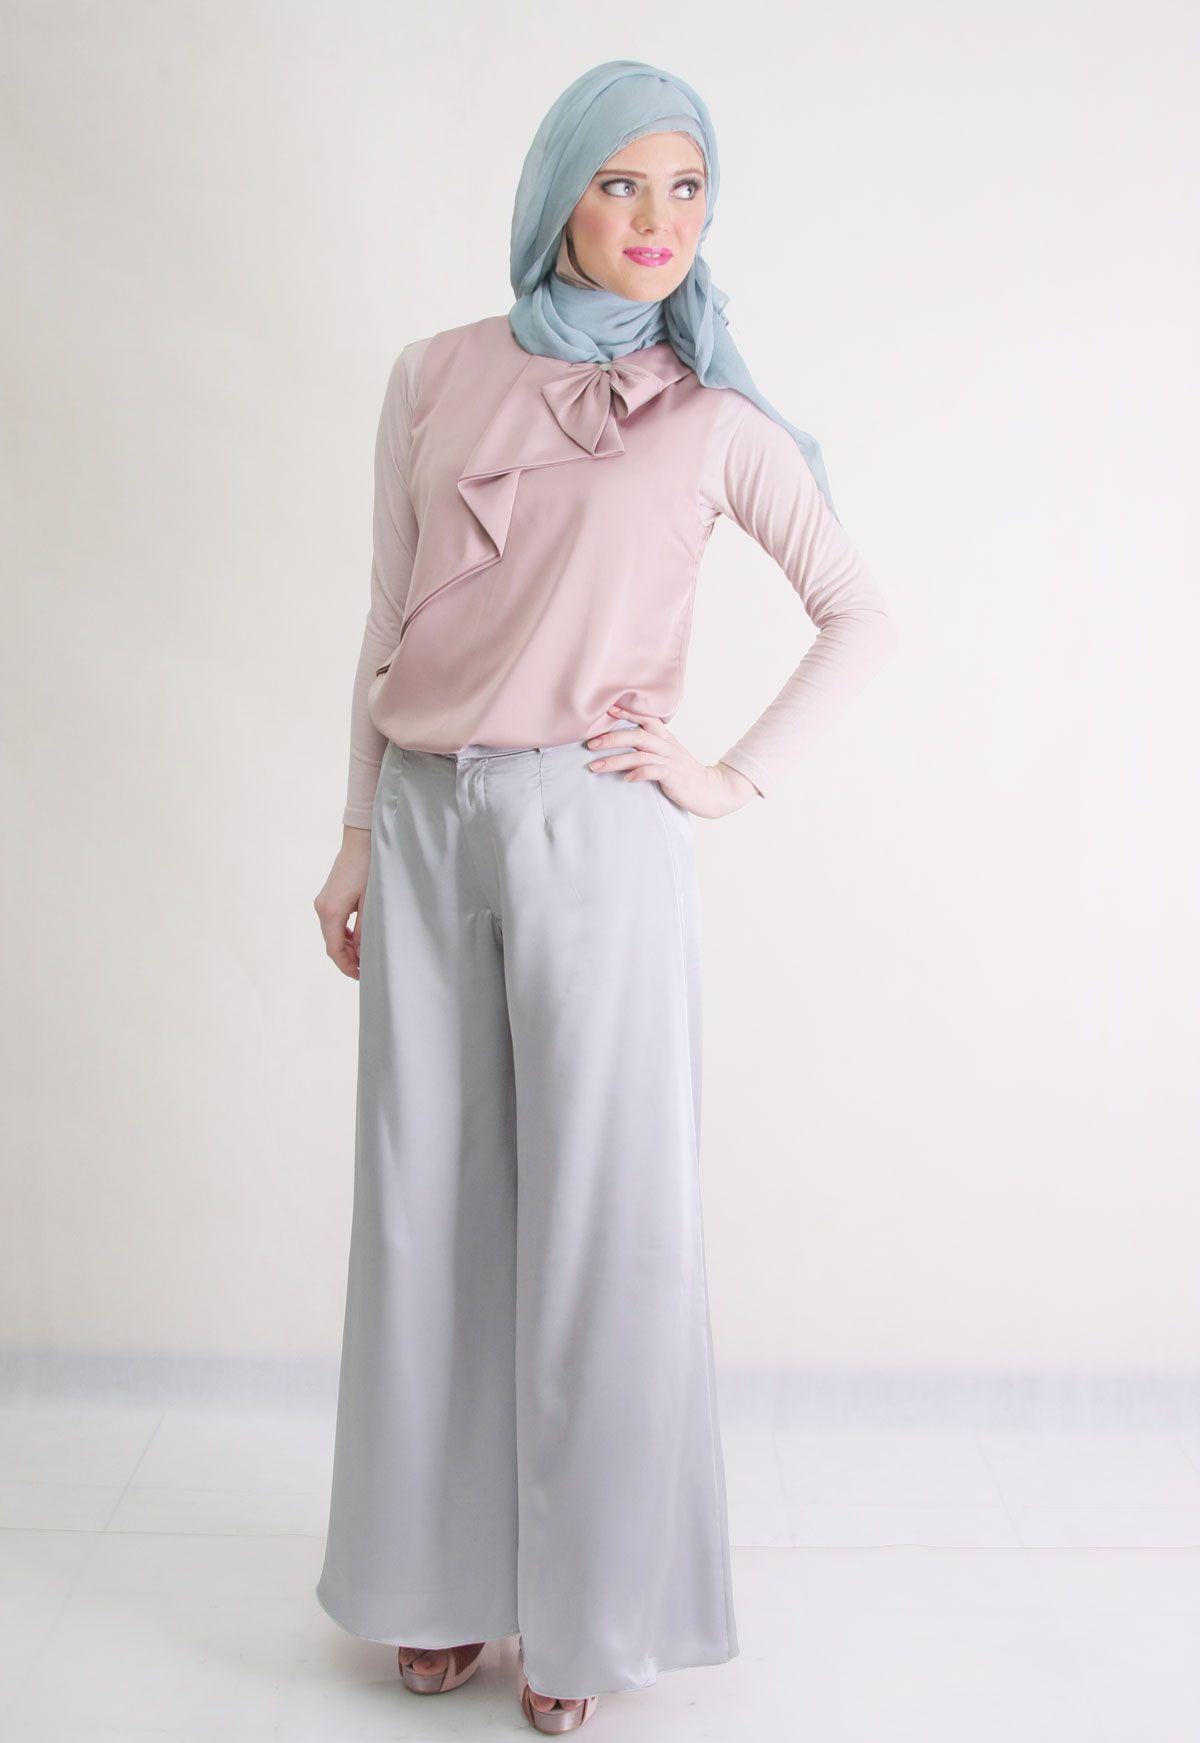 Ria Miranda Lily Top ♥ Style Wear Pinterest